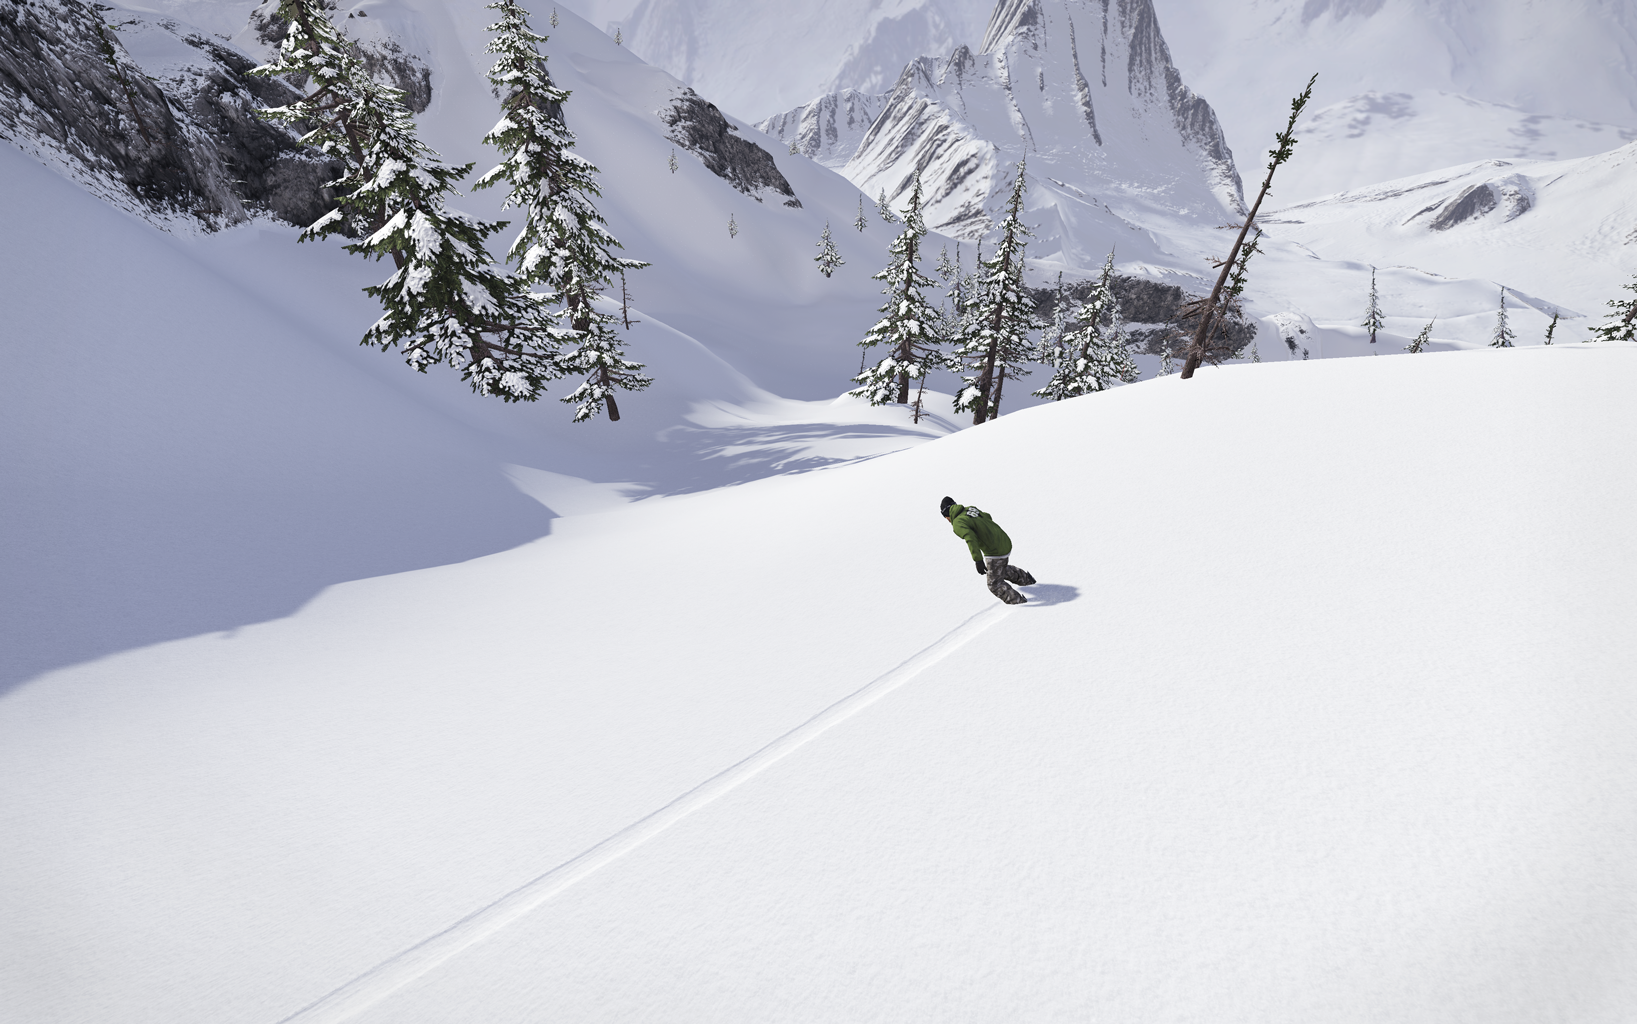 snowboard game screenshot 2015 01